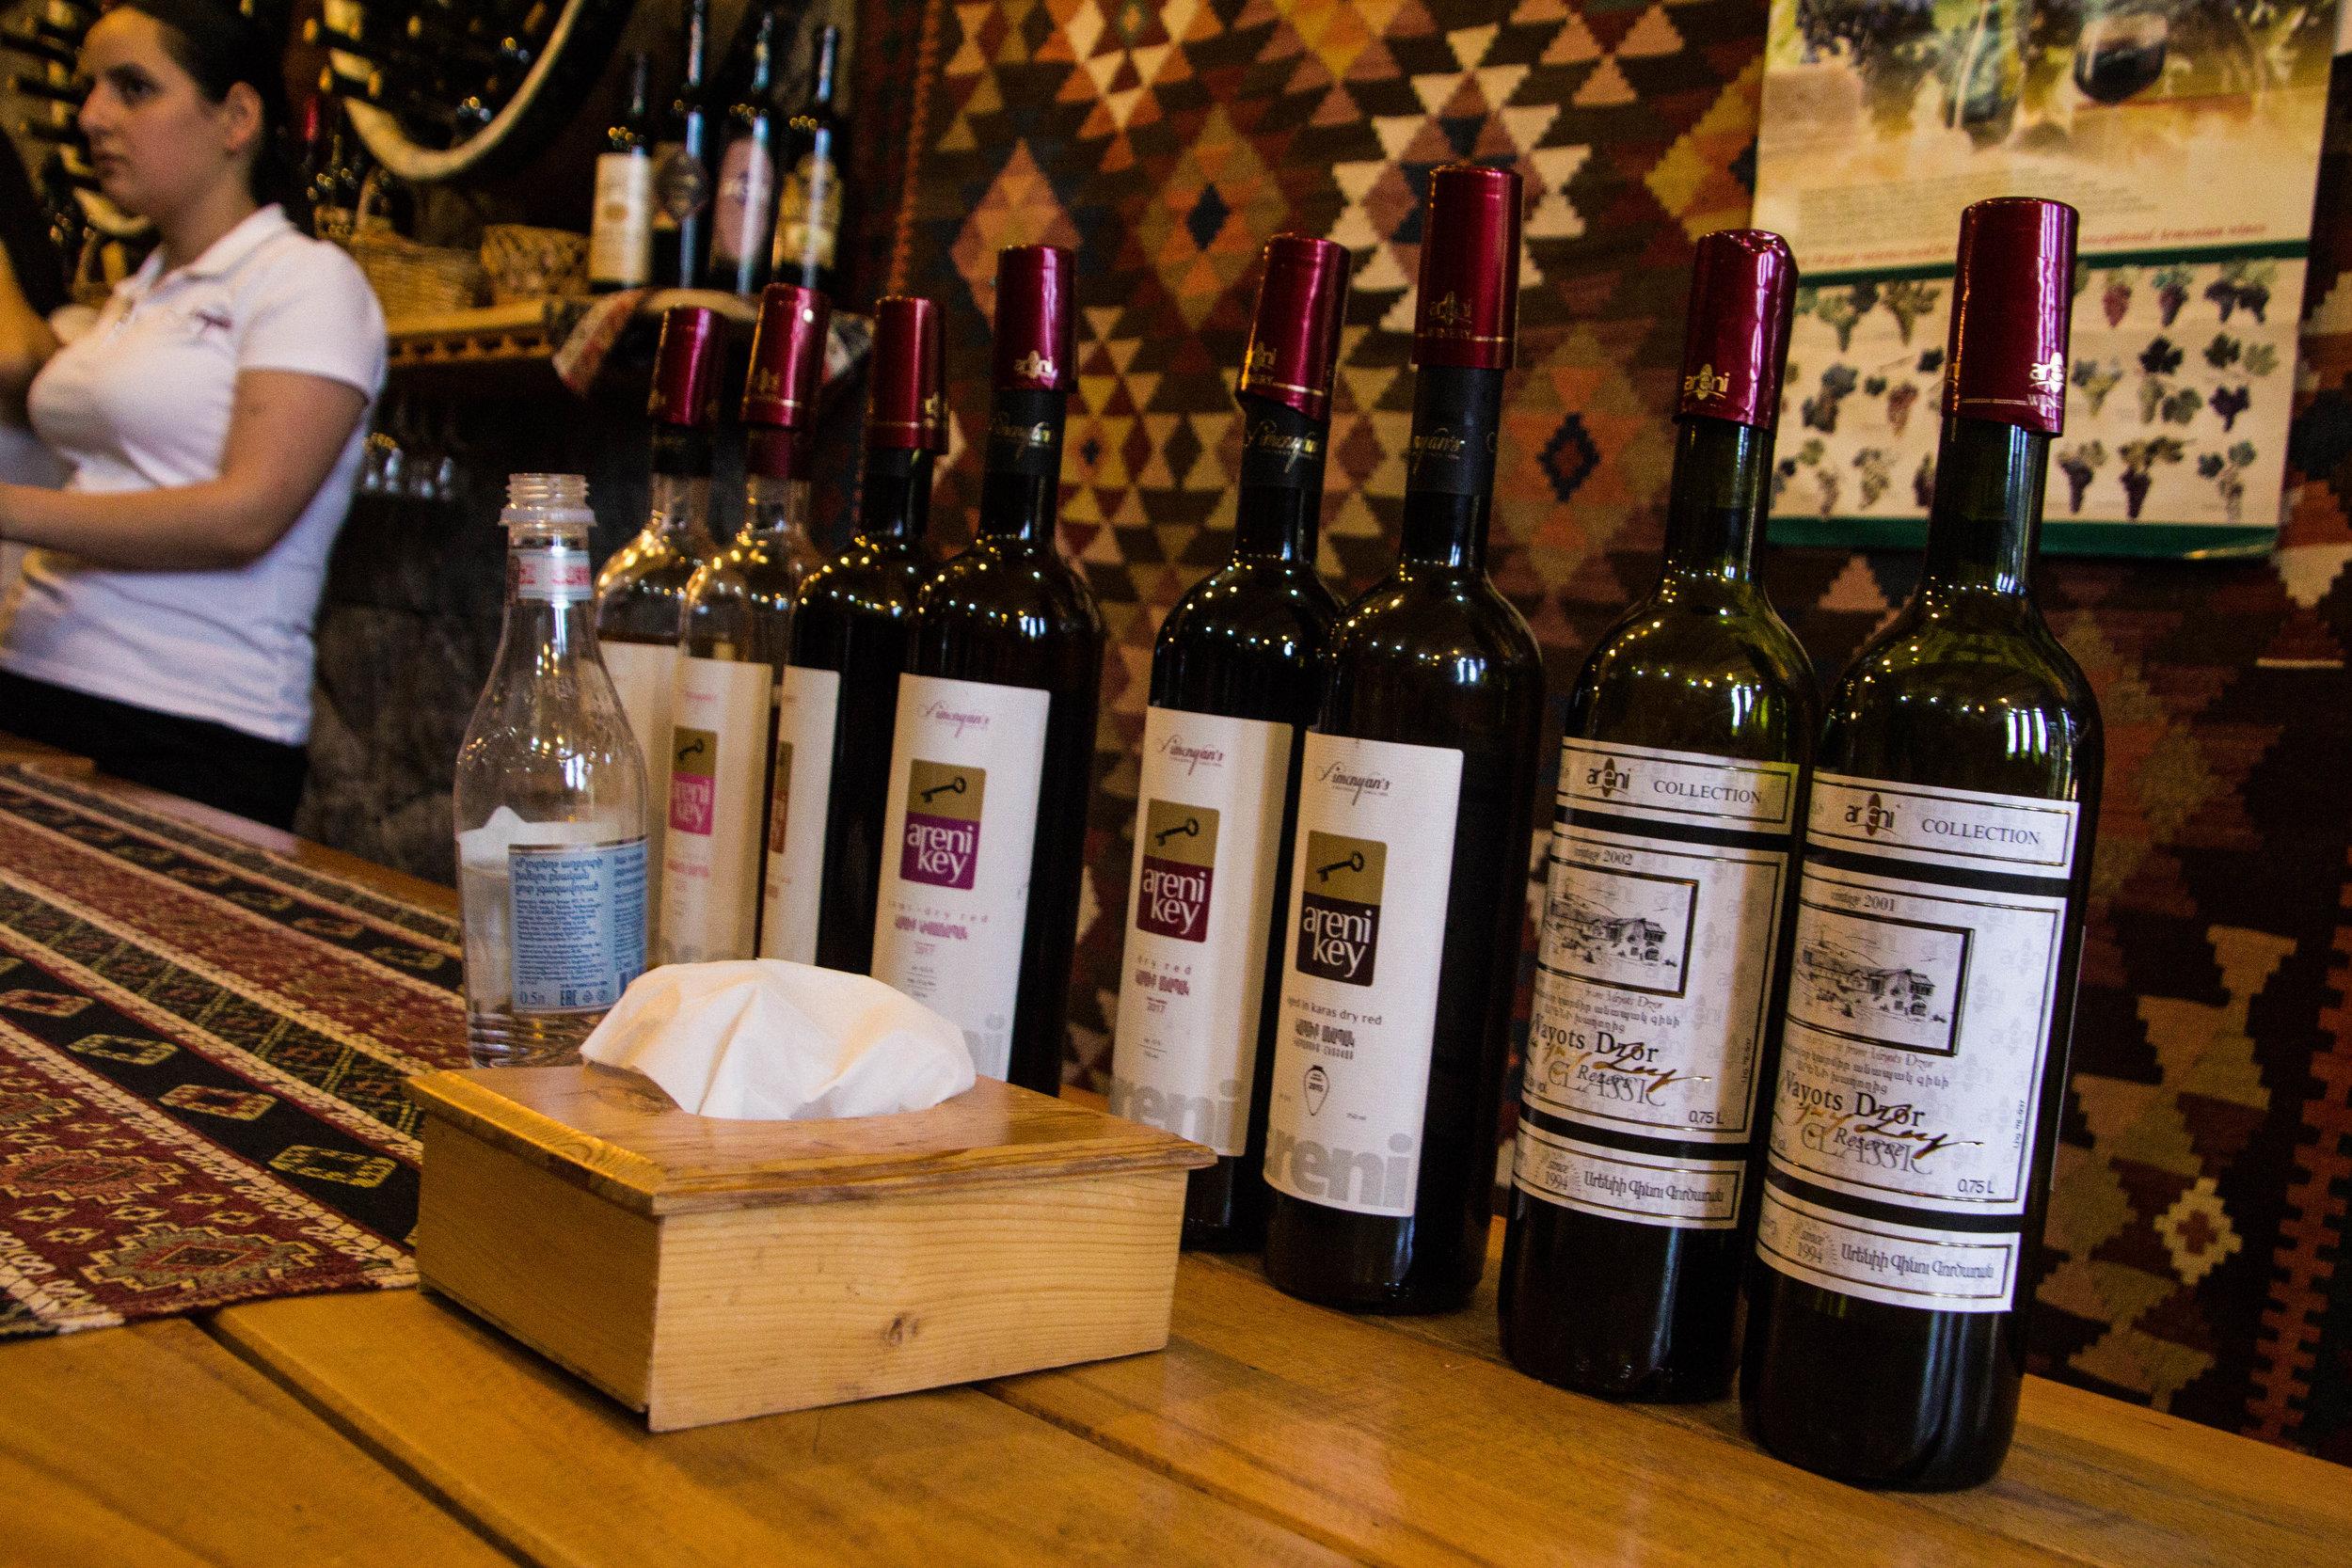 armenian-wine-tasting-7.jpg